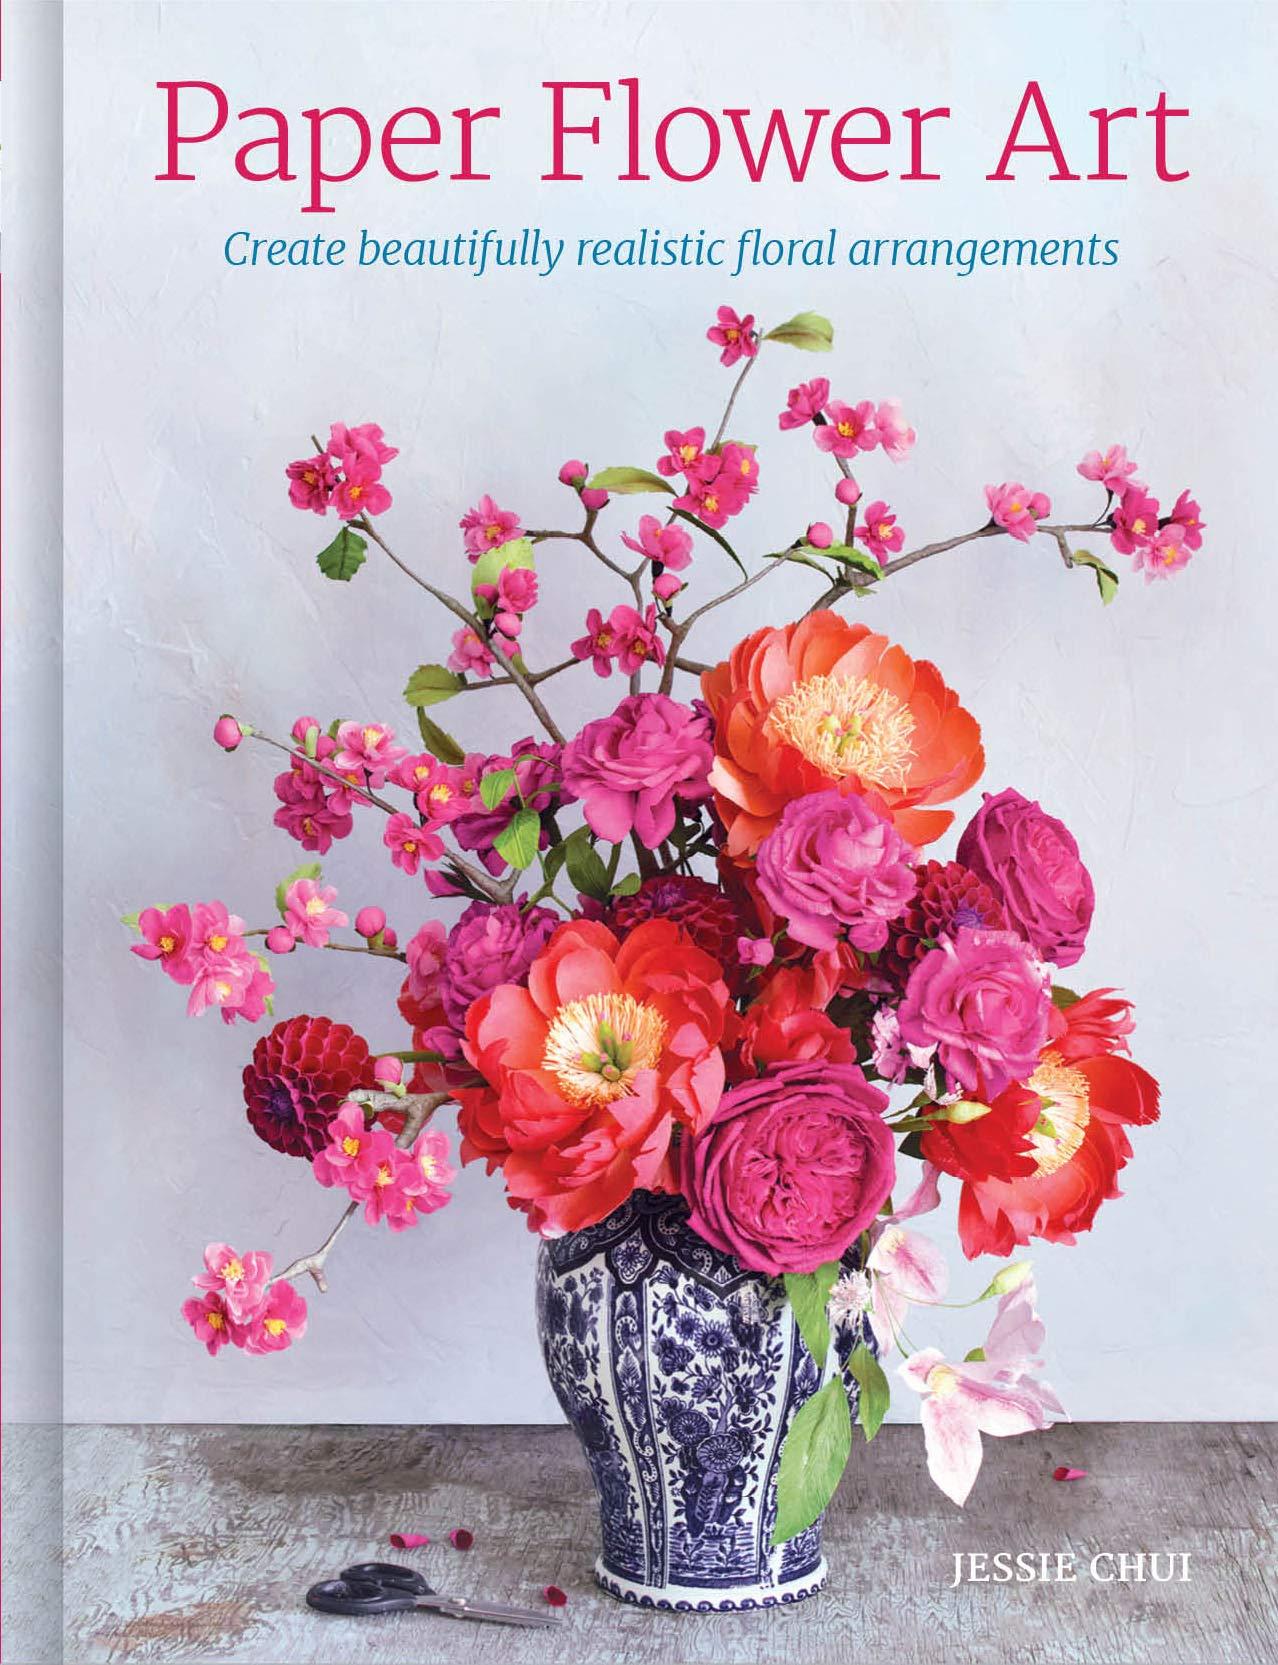 Paper Flower Art  Create Beautifully Realistic Floral Arrangements